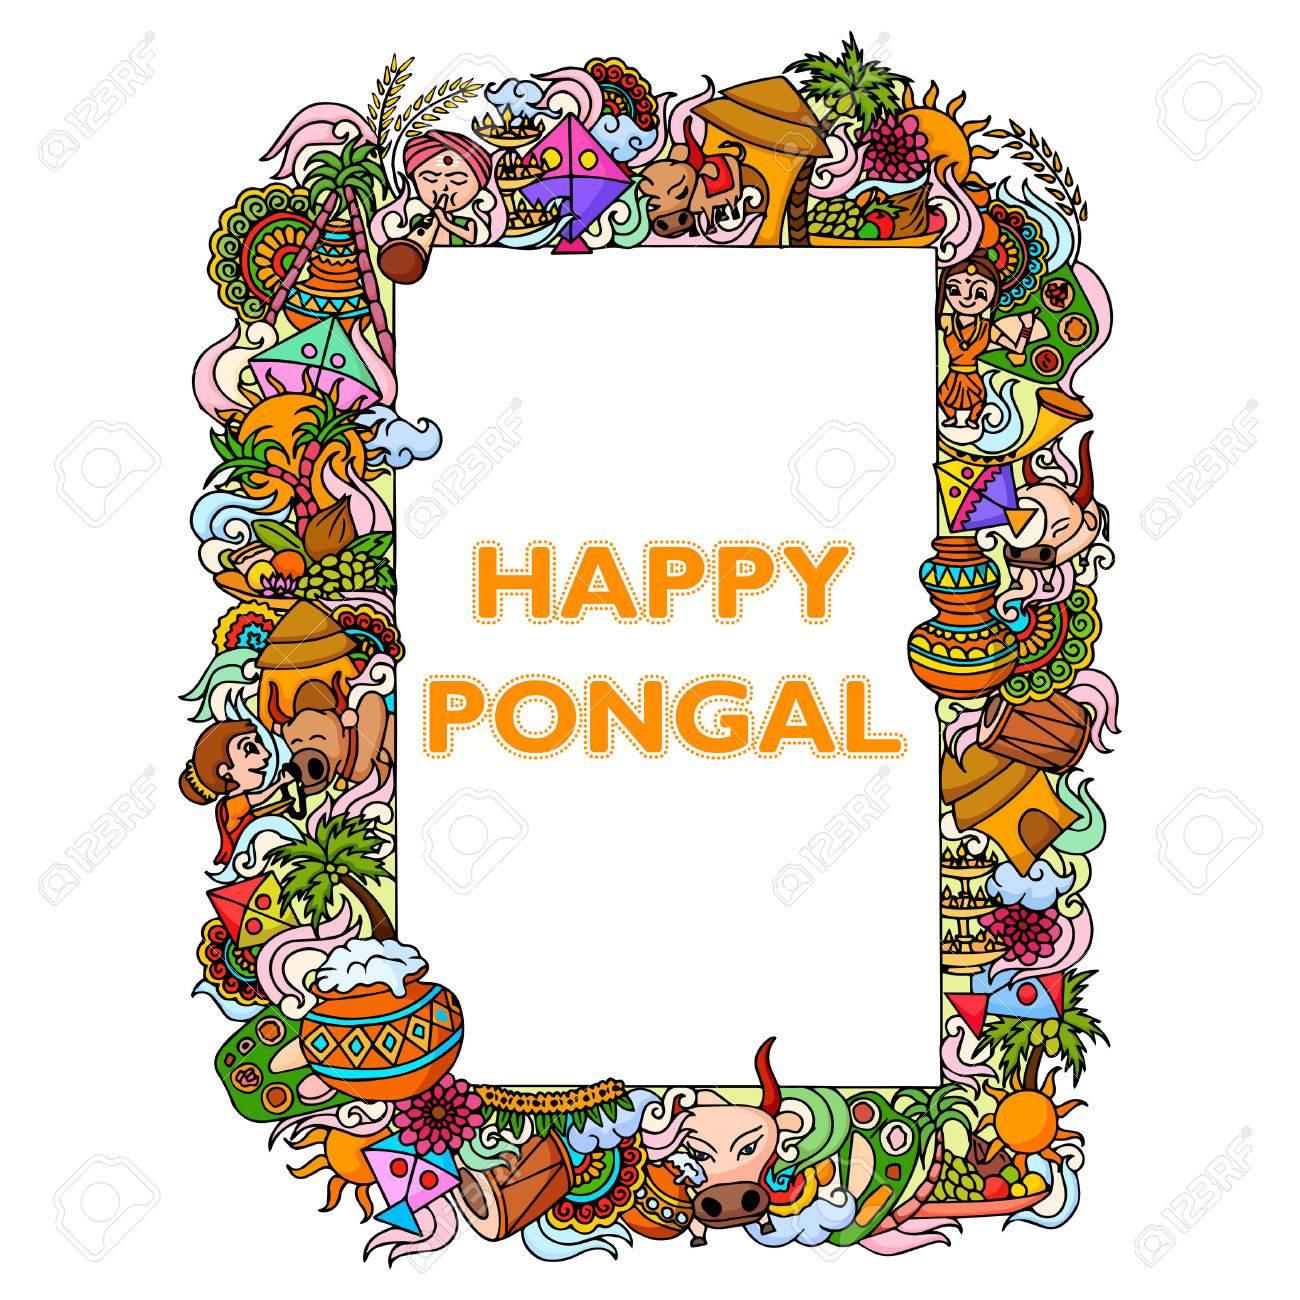 vector illustration of Happy Pongal celebration background - 50263807